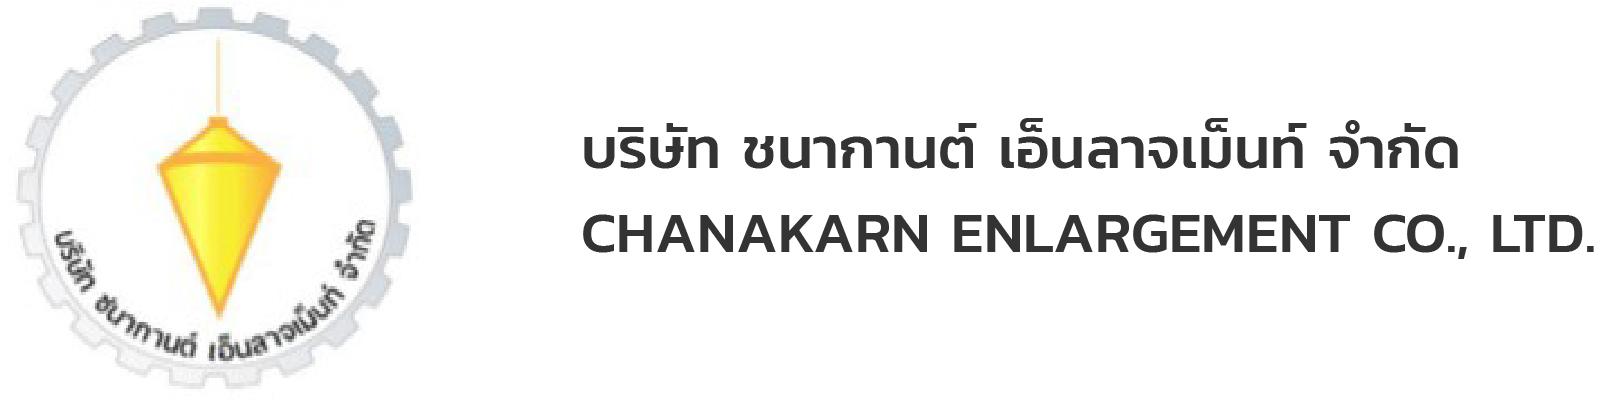 CHANAKARN ENLARGEMENT CO., LTD.